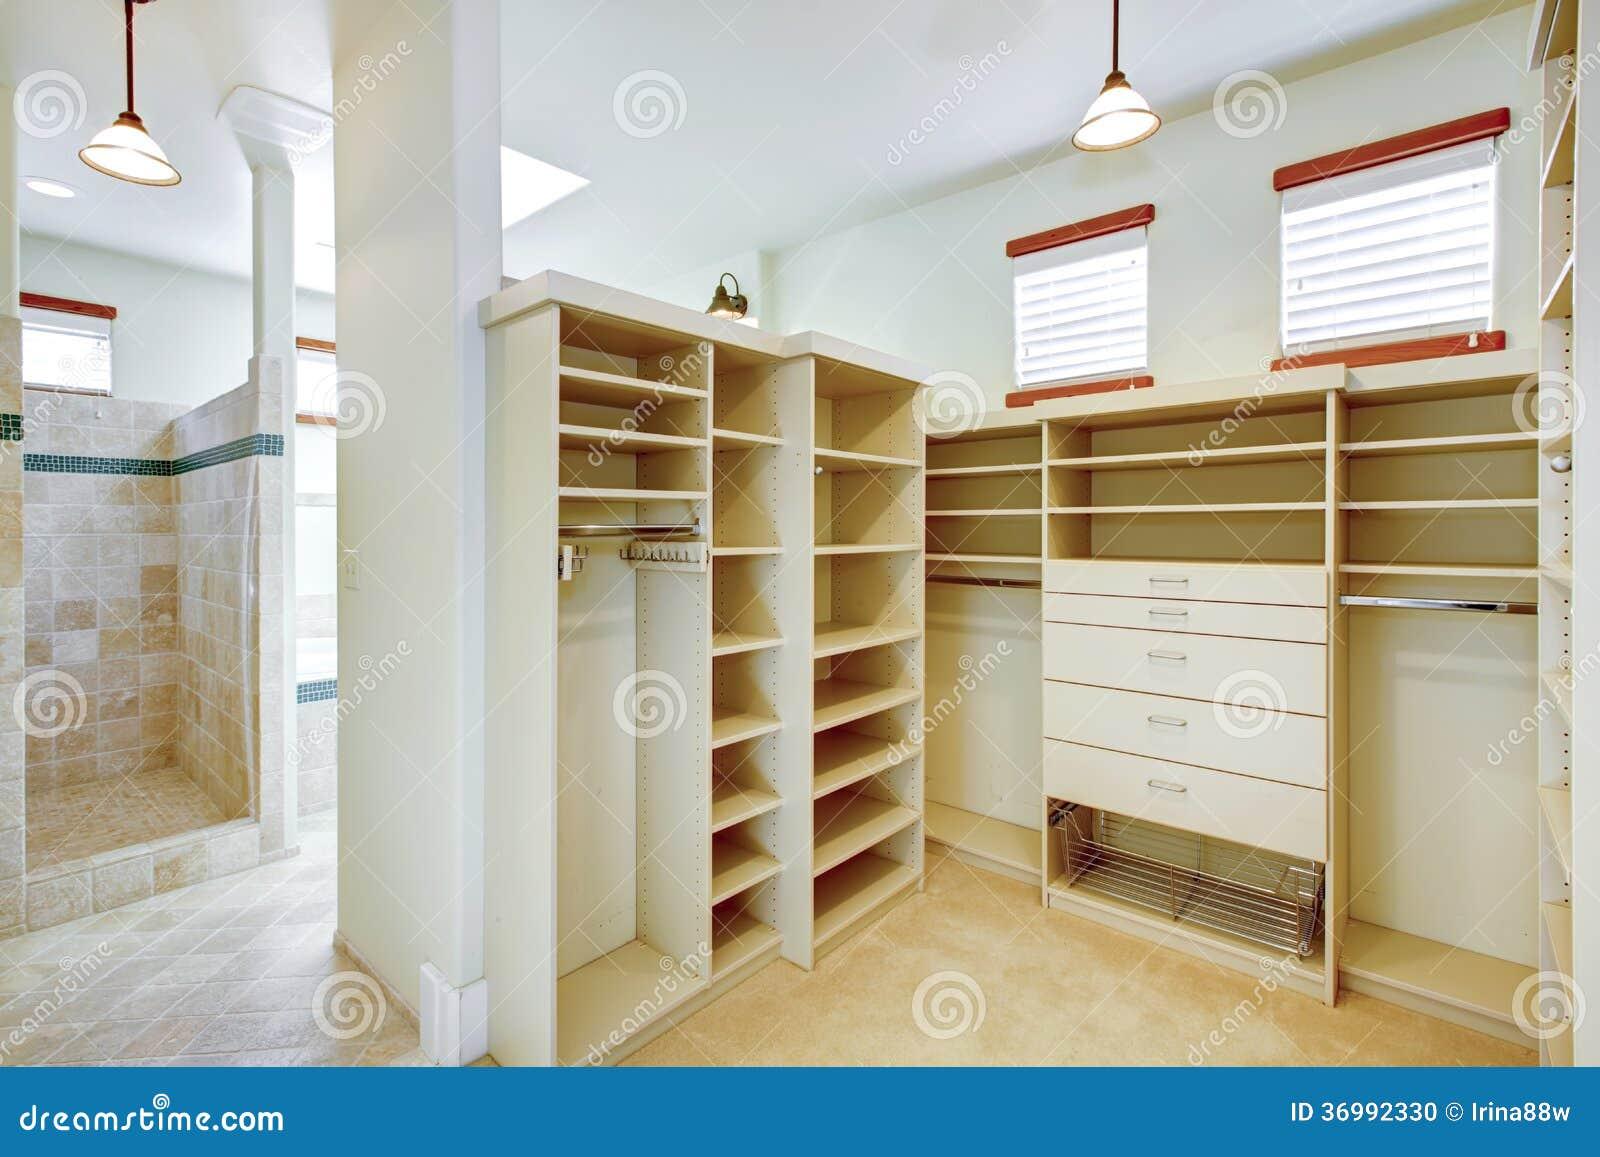 Salle de bains chaude lumineuse combin e avec la penderie photo stock image - Salle de bain lumineuse ...